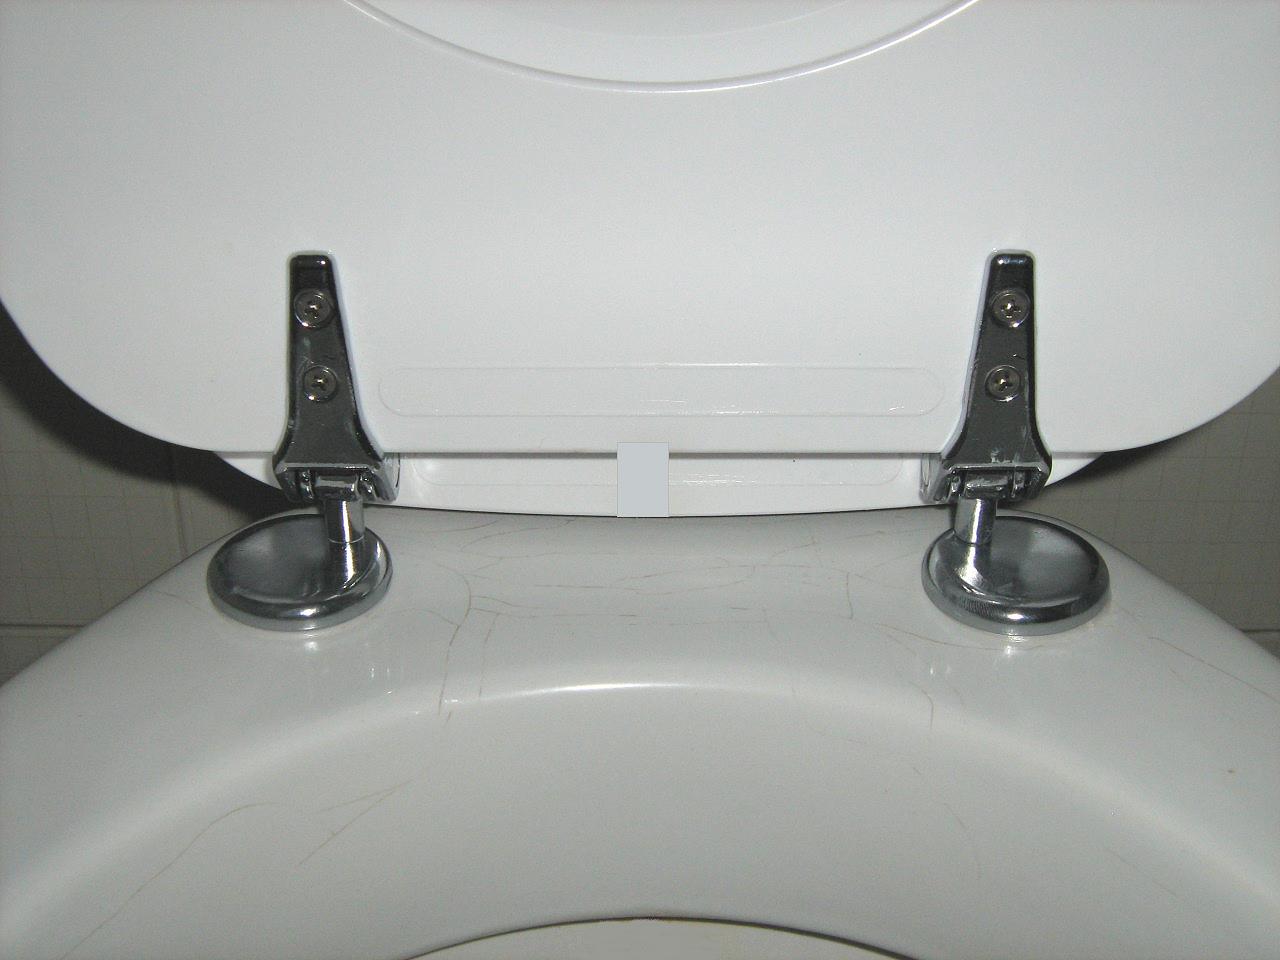 Sedili Wc Ikea : Tavolette wc tutte le offerte : cascare a fagiolo